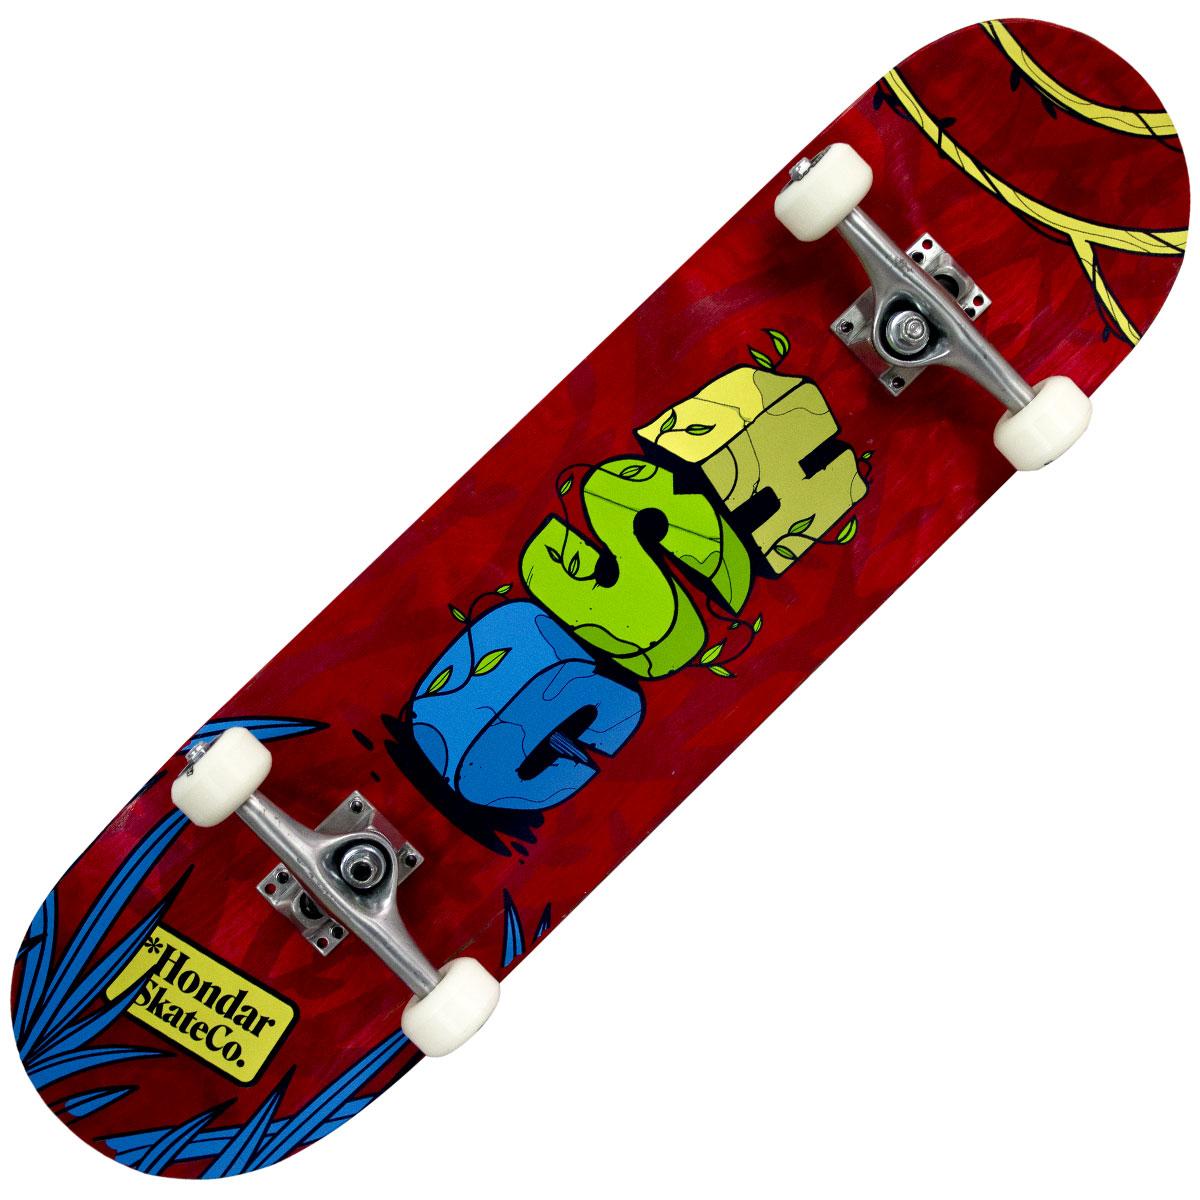 Skate Completo Montado Semi Profissional Hondar